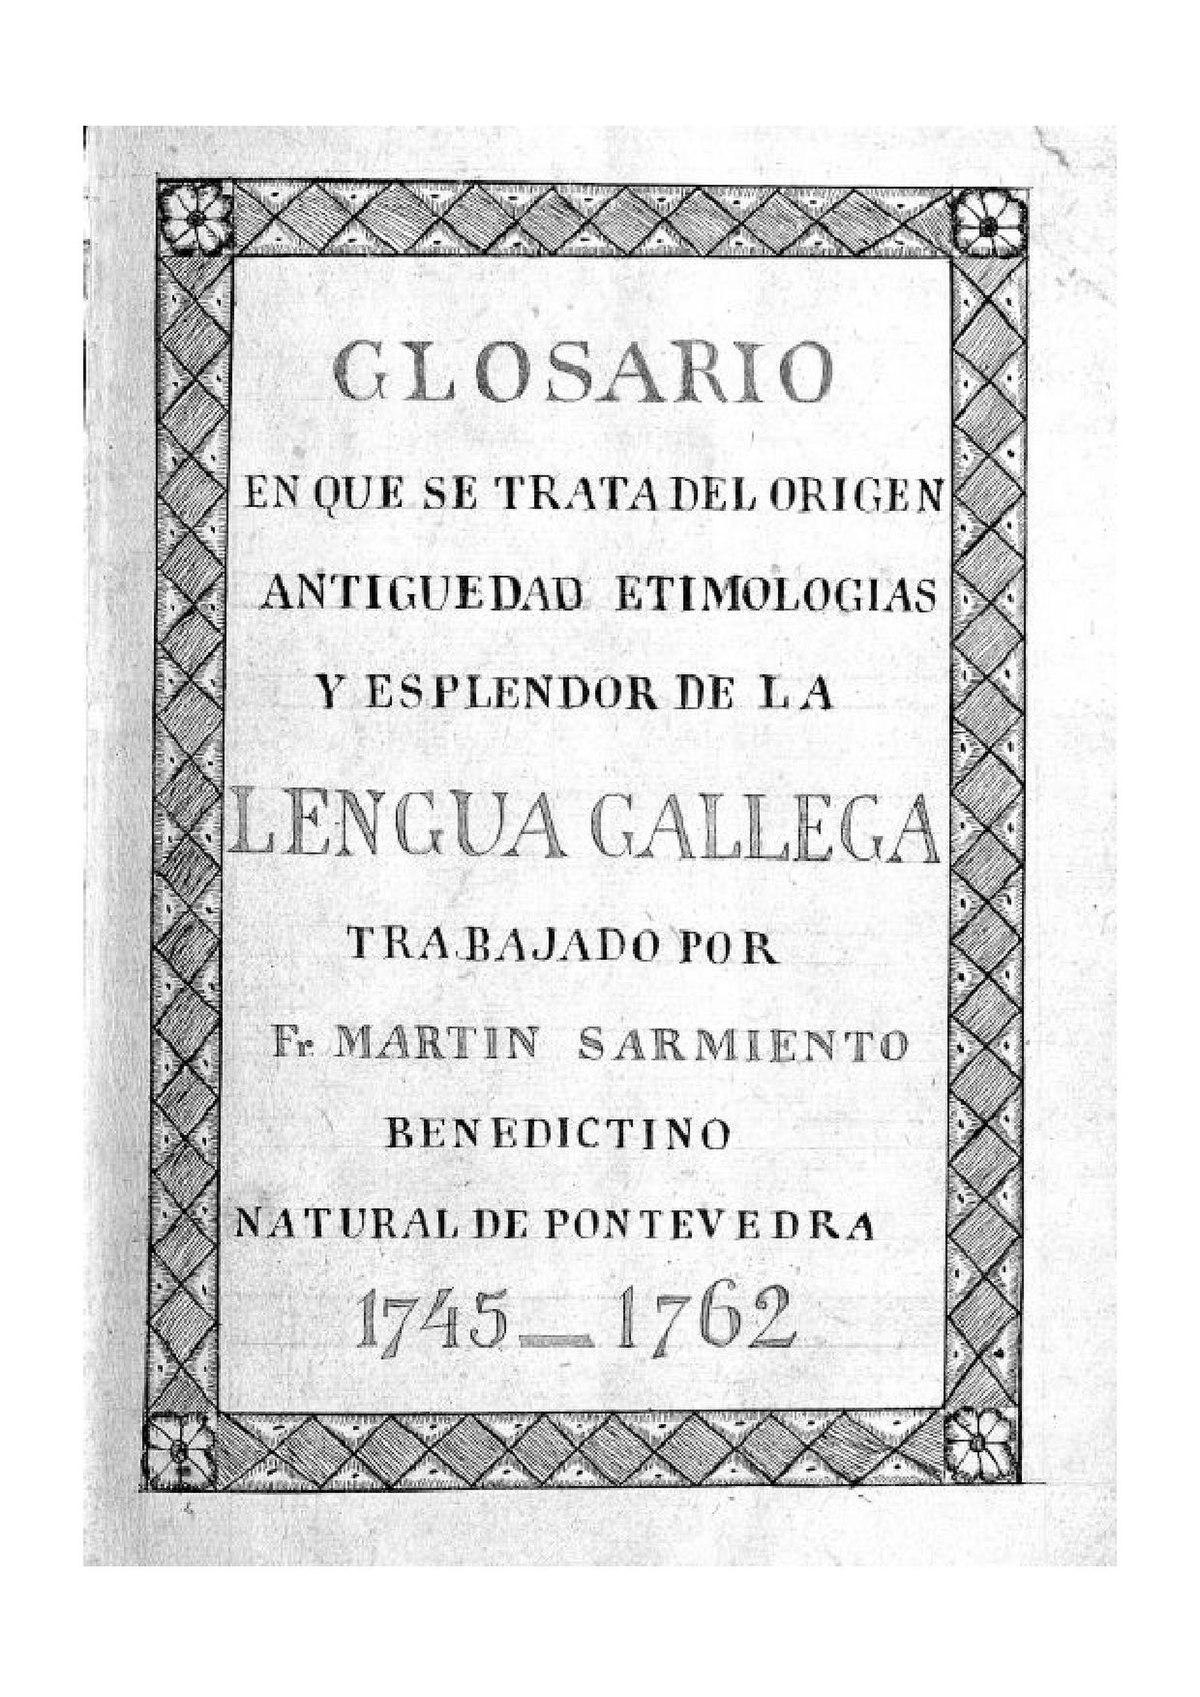 https://upload.wikimedia.org/wikipedia/commons/thumb/0/03/Coloquio_en_mil_duascentas_coplas_galegas.pdf/page1-1200px-Coloquio_en_mil_duascentas_coplas_galegas.pdf.jpg